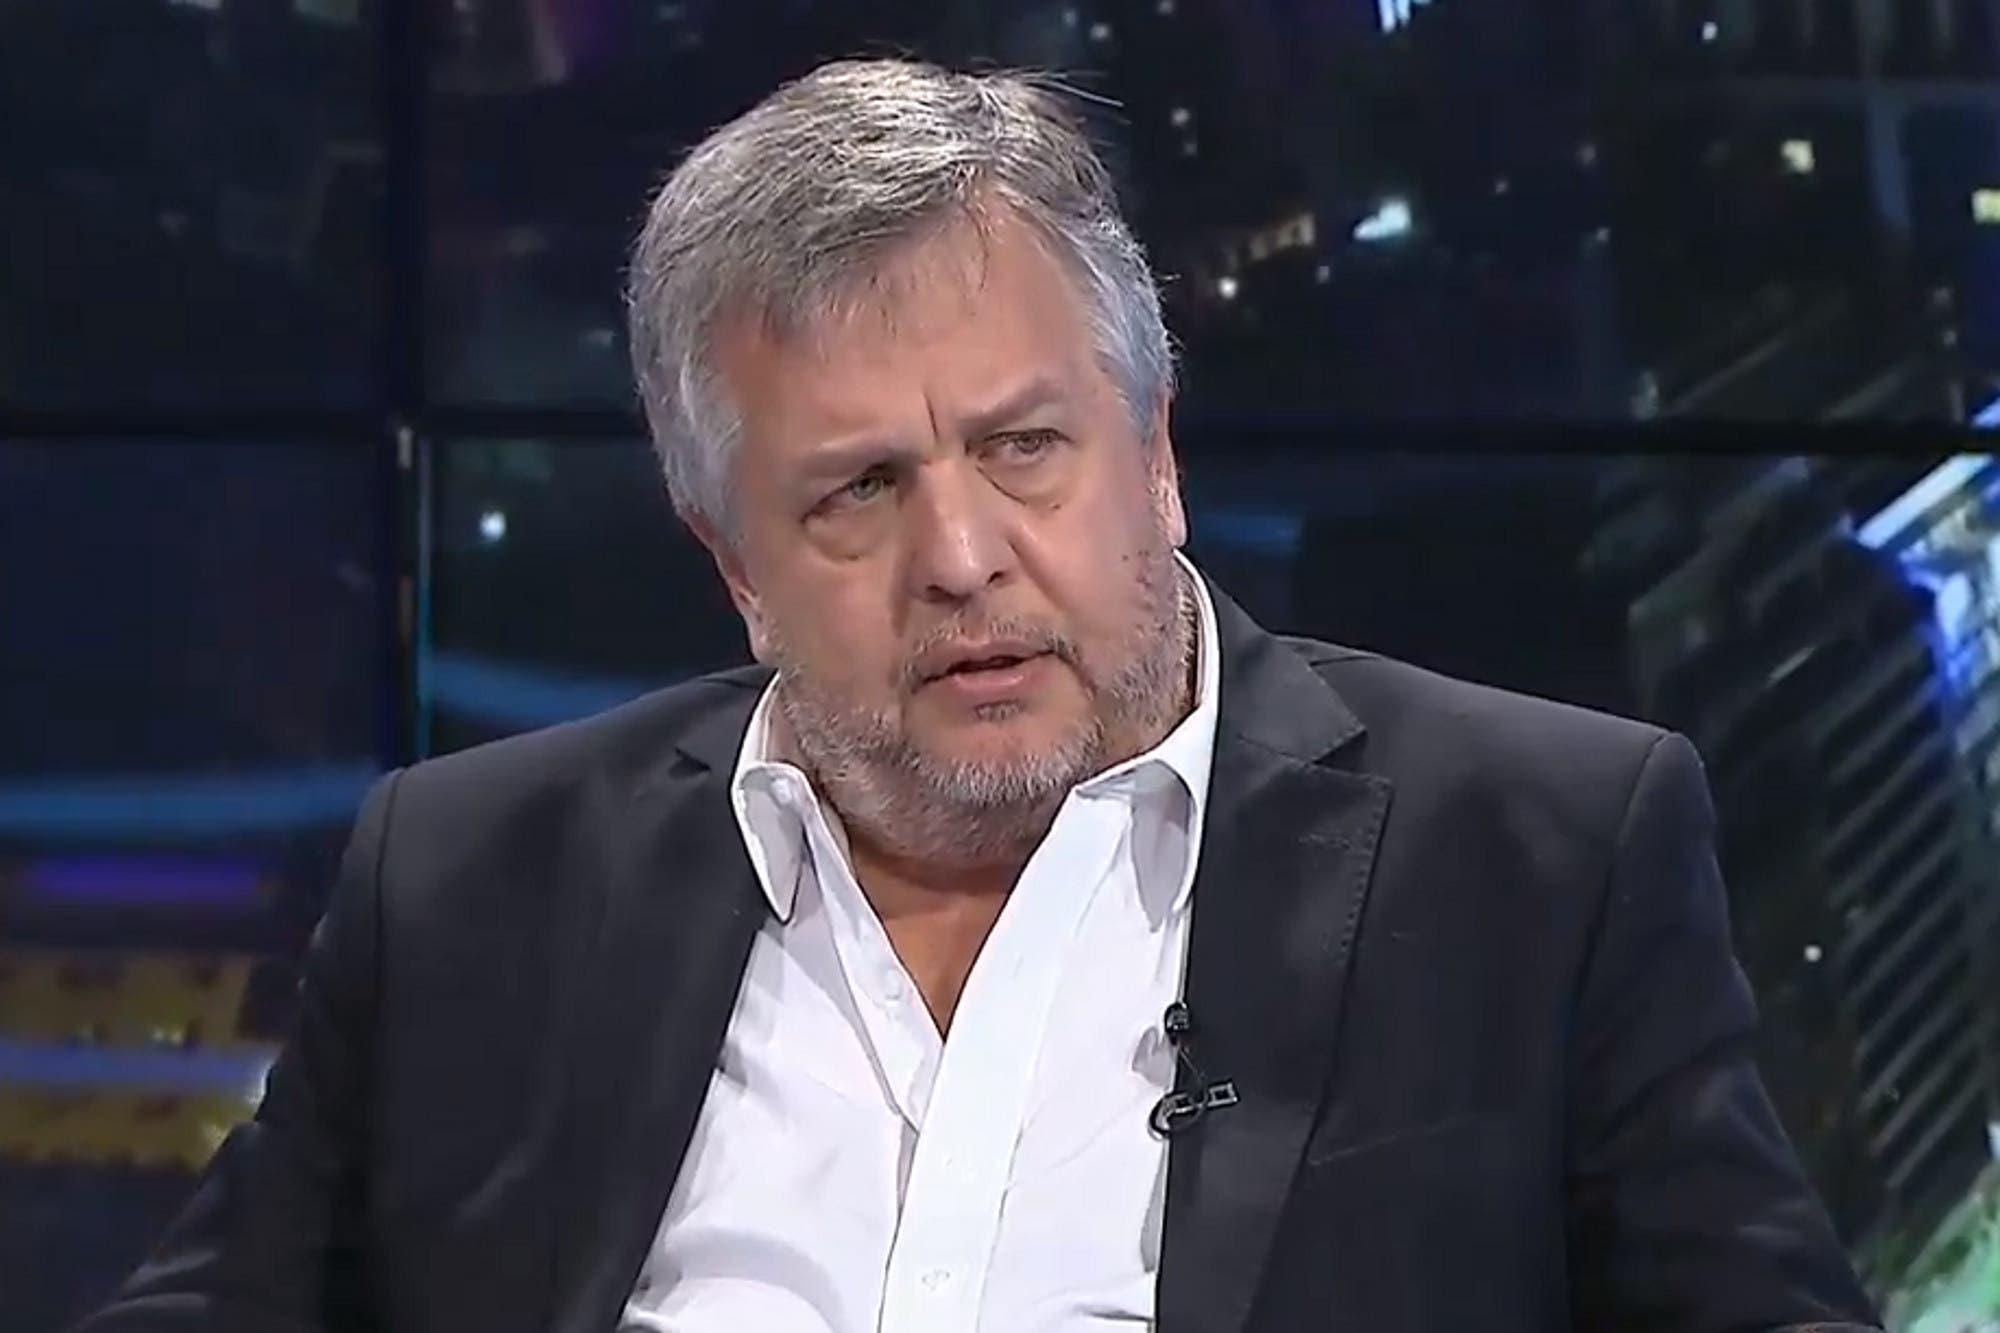 Carlos Stornelli